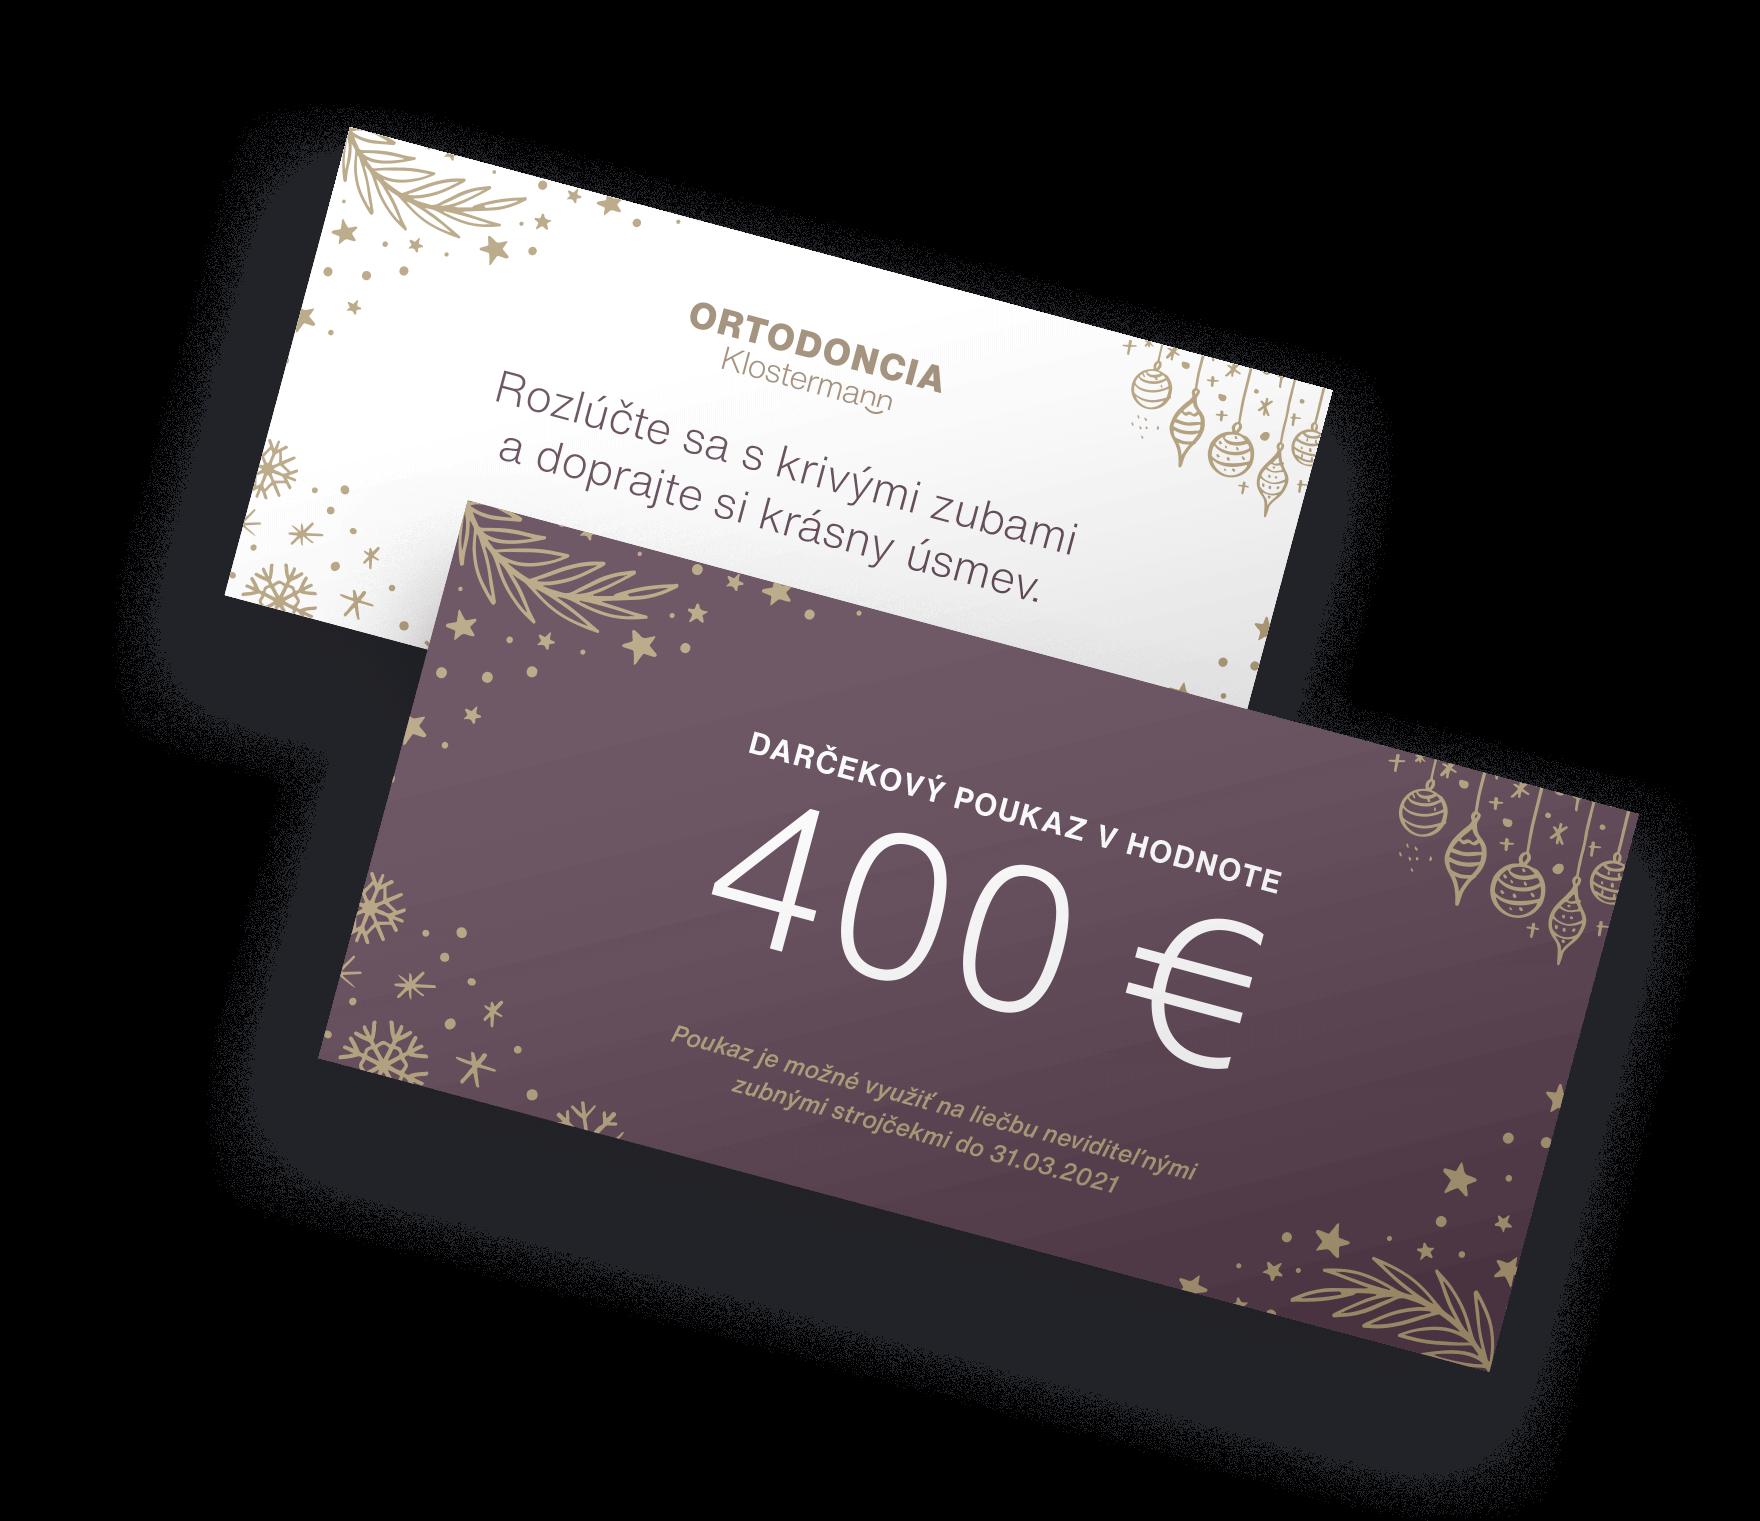 400 € discount onInvisalign